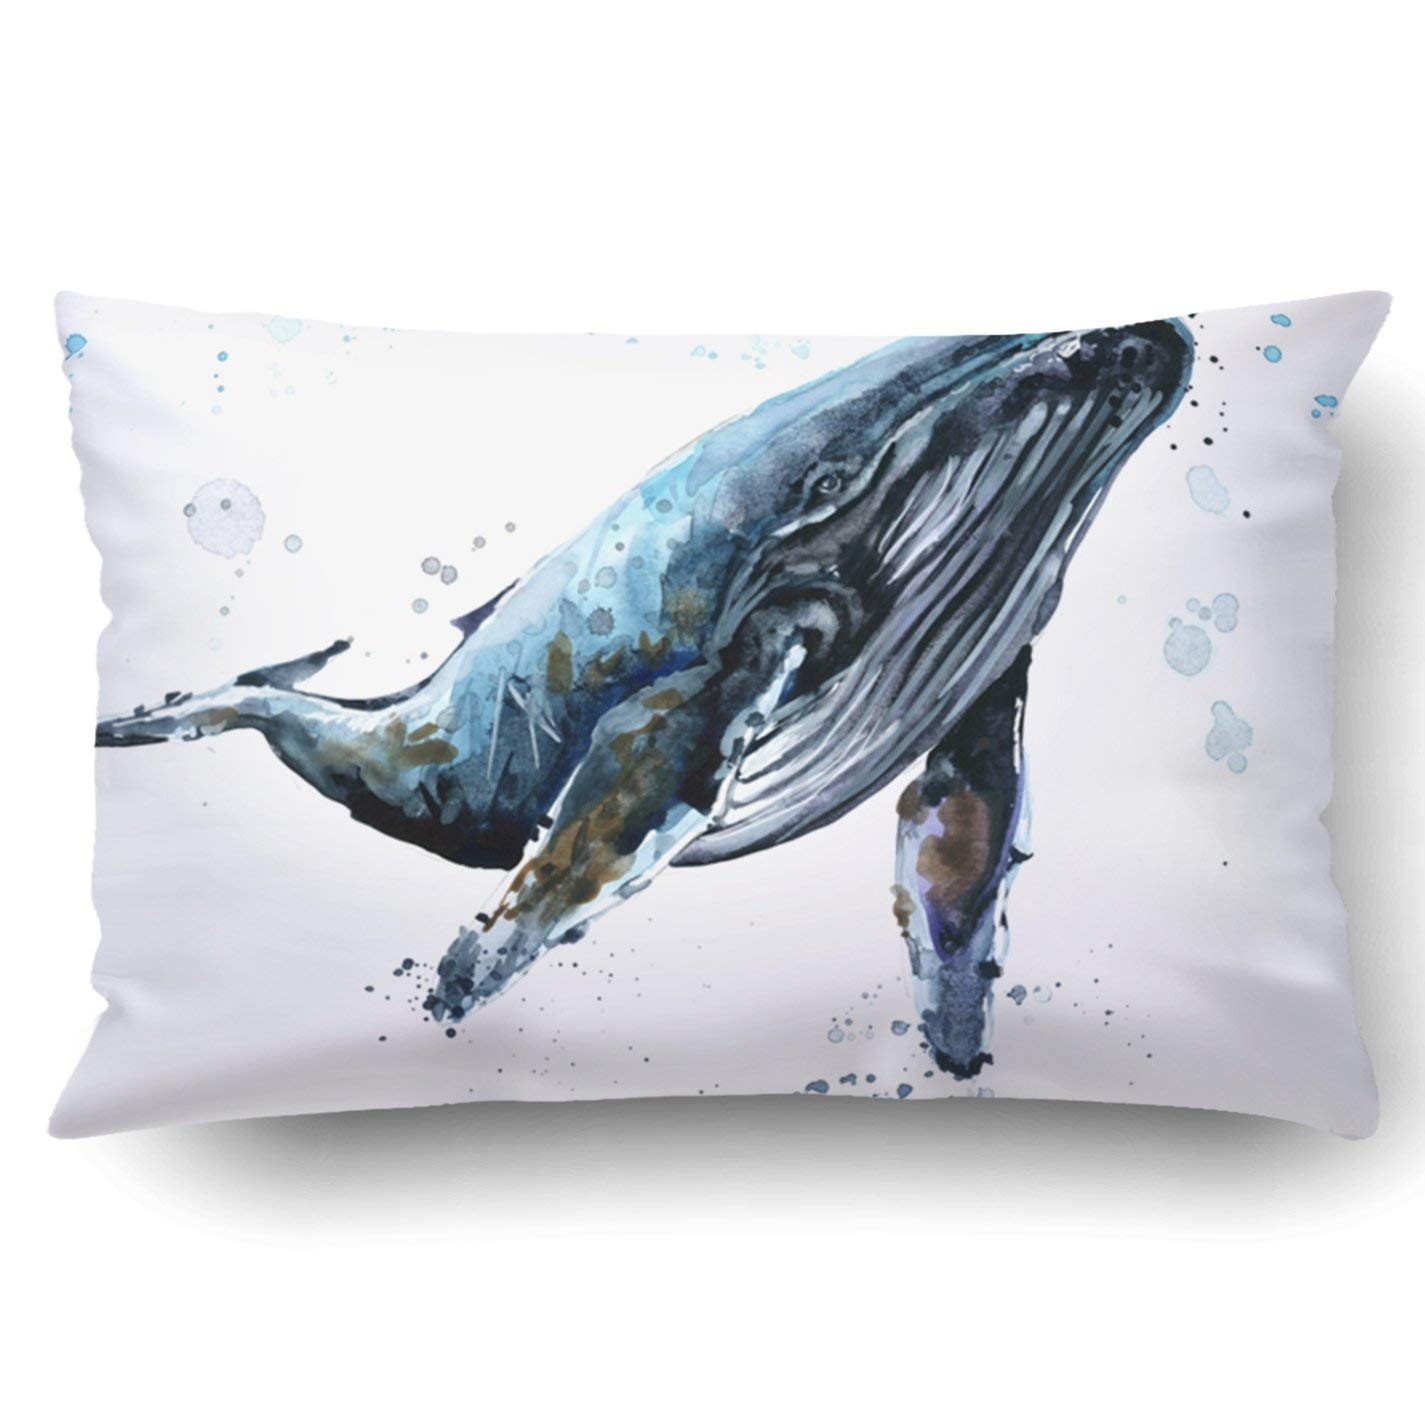 Bpbop Humpback Whale Watercolor Underwater Fauna Pillowcase Throw Pillow Cover Case 20x30 Inches Walmart Com Walmart Com